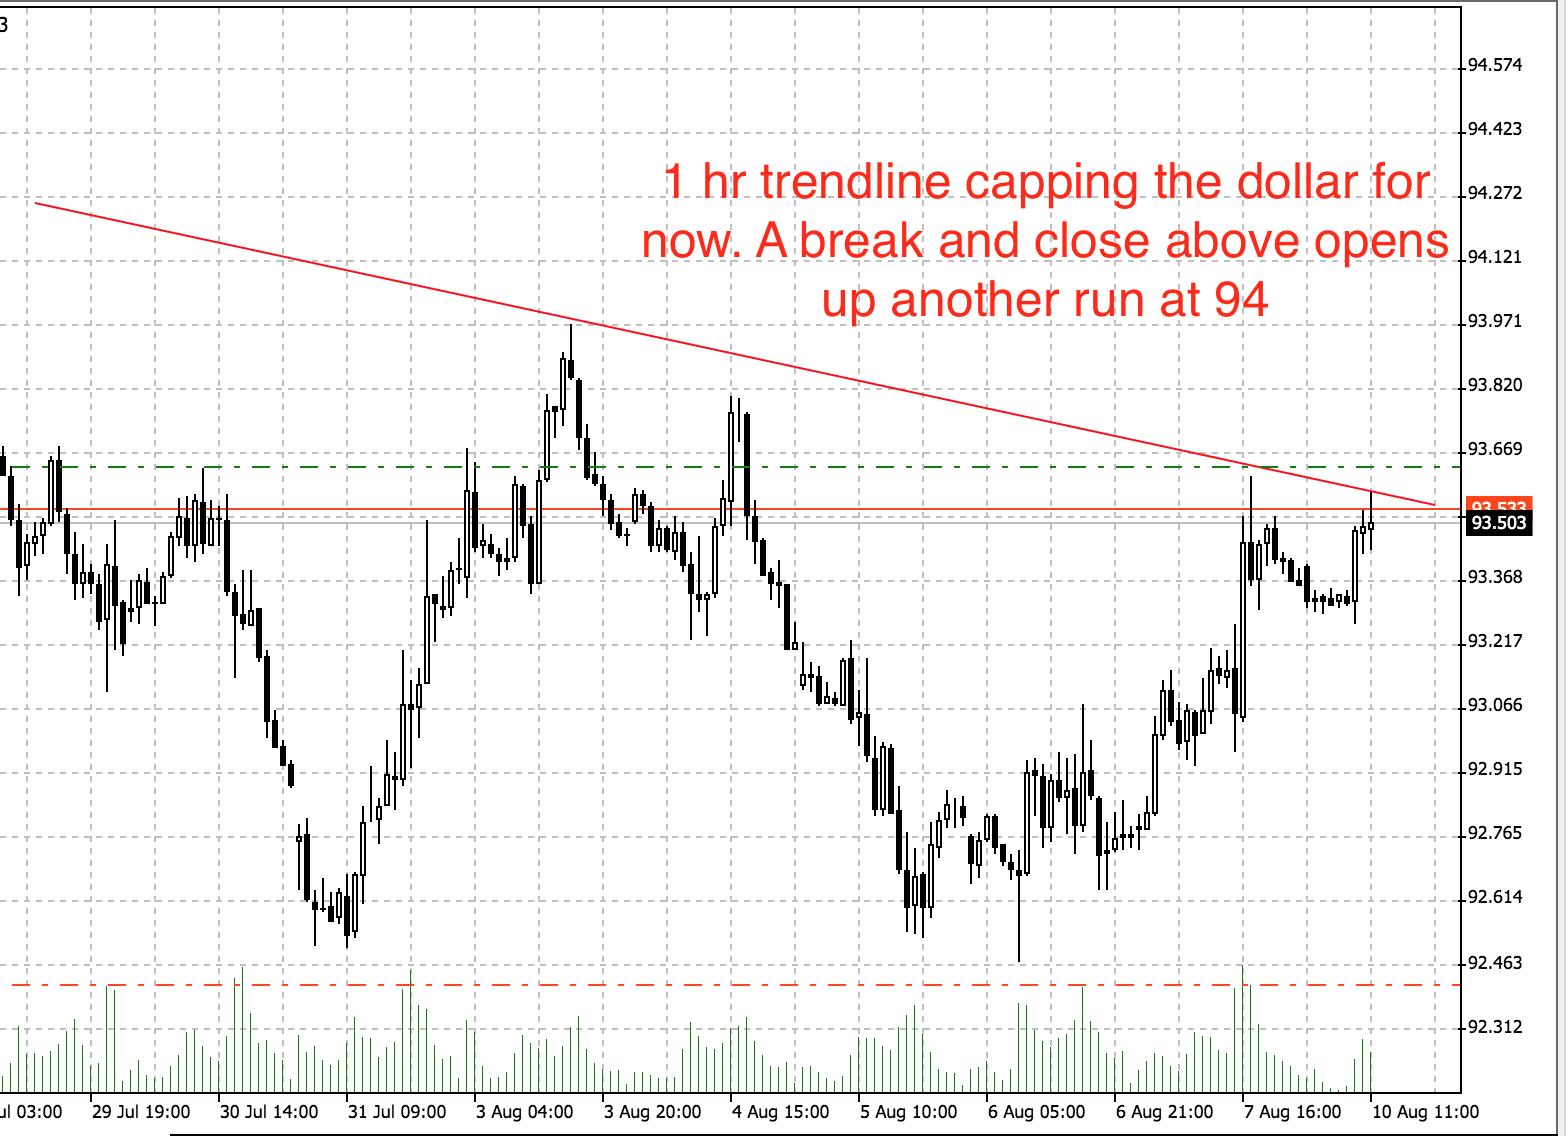 Expecting USD strength to follow through